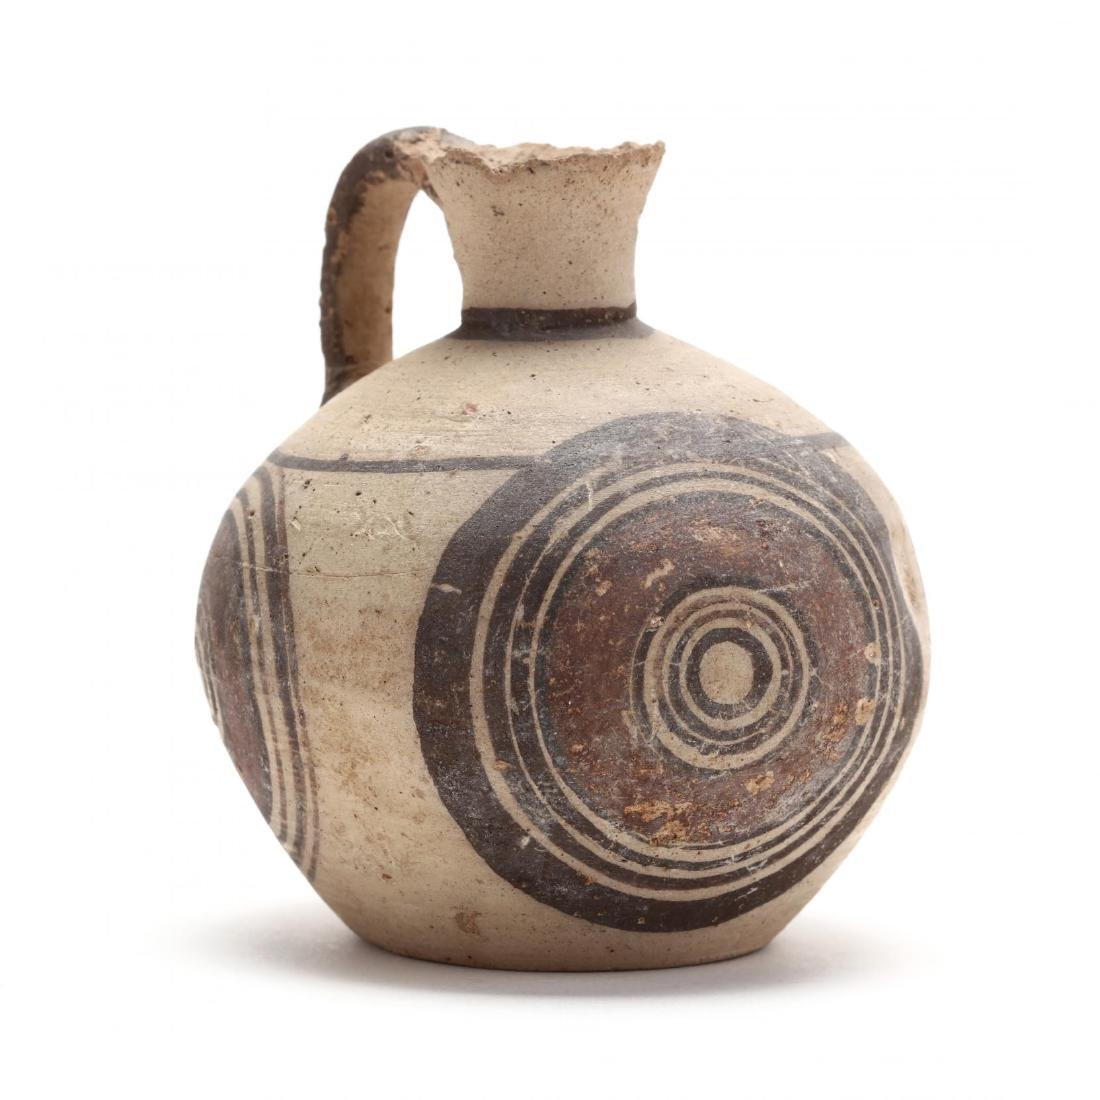 Cypro-Geometric Bichrome Jug, Ex. Eban Collection